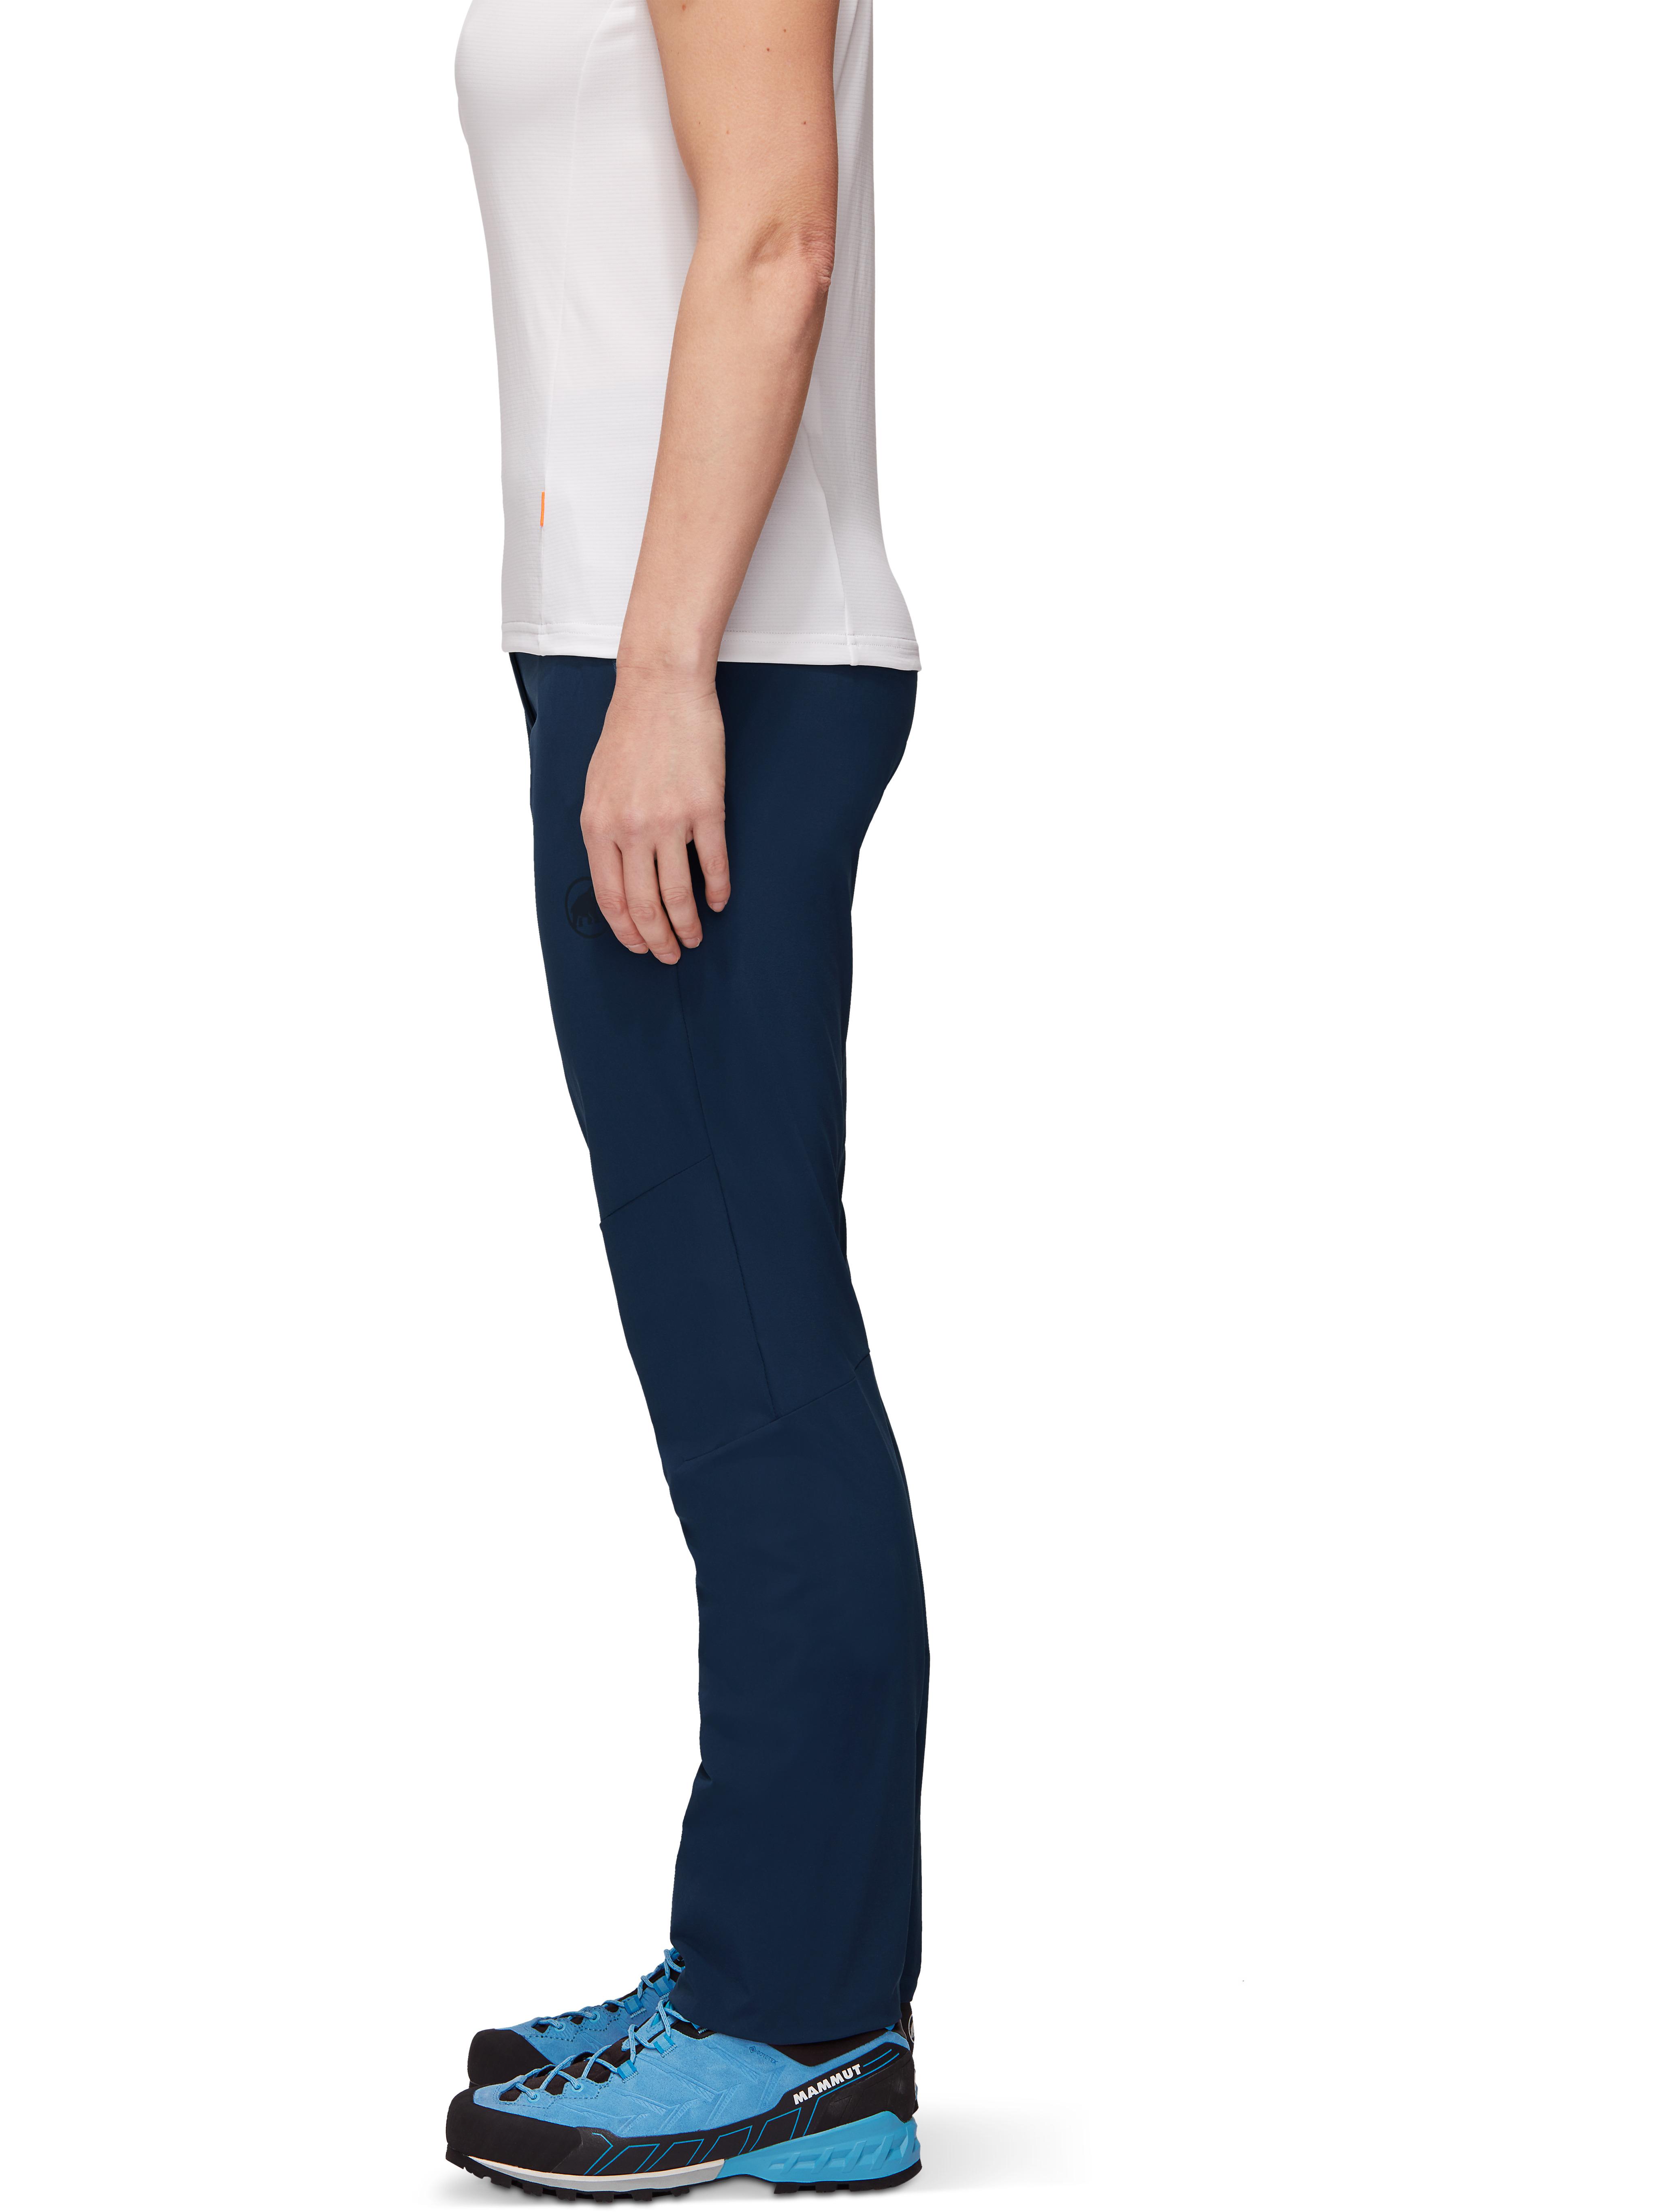 Runbold Pants Women product image